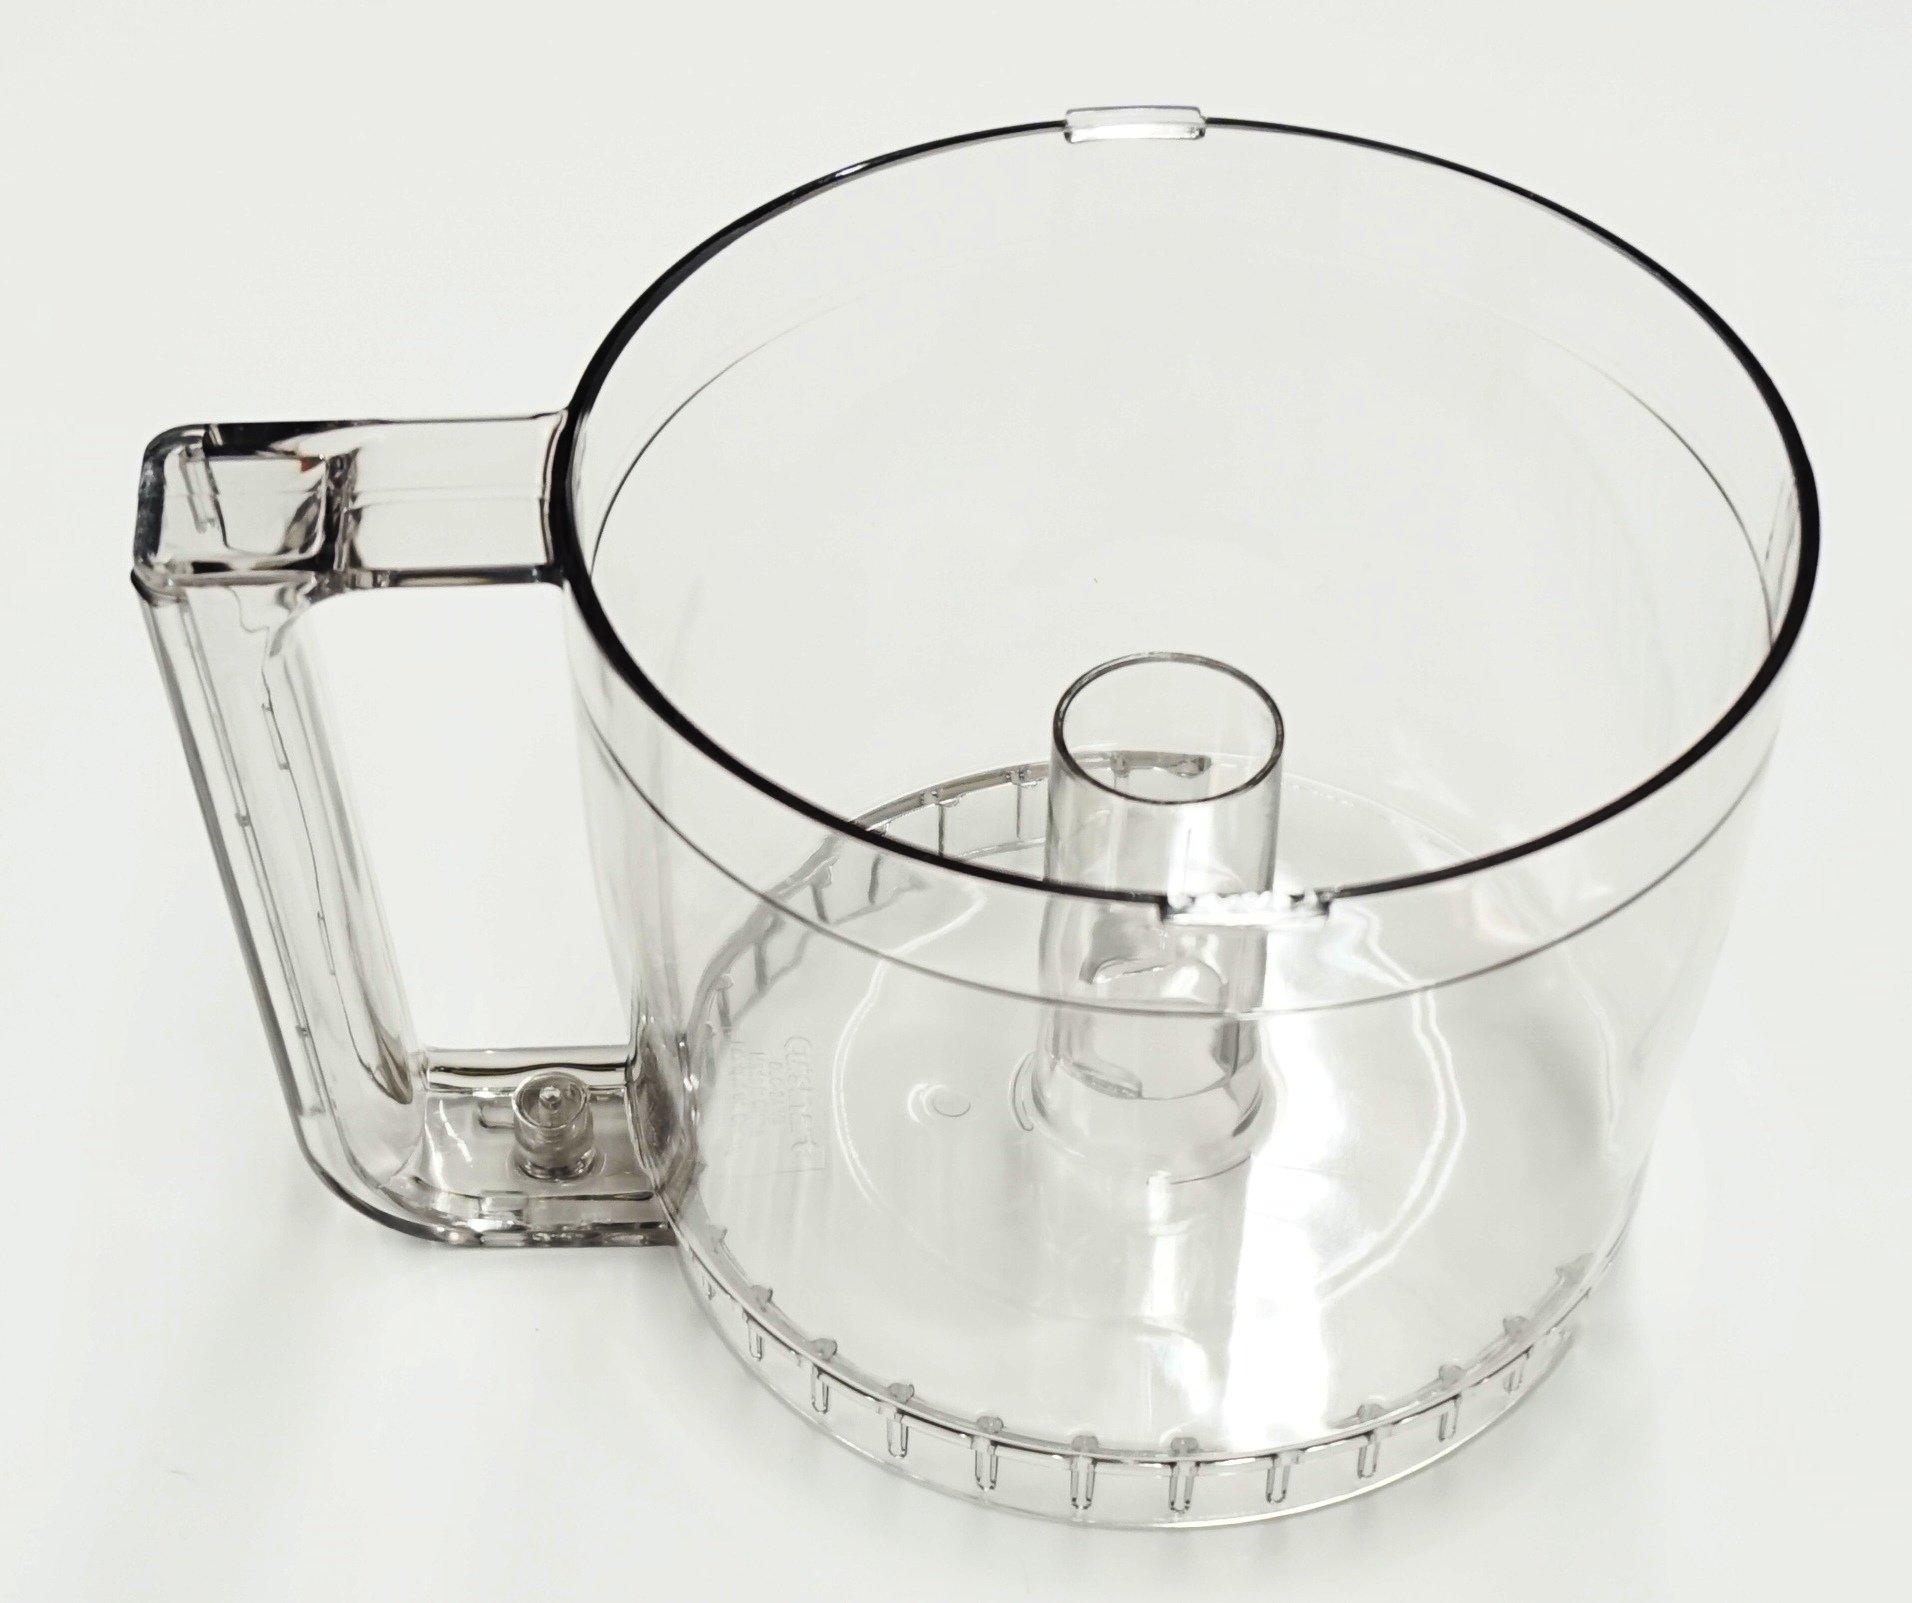 Cuisinart DLC-2AWB-1 Work Bowl for Mini-Prep Plus (DLC-2A)